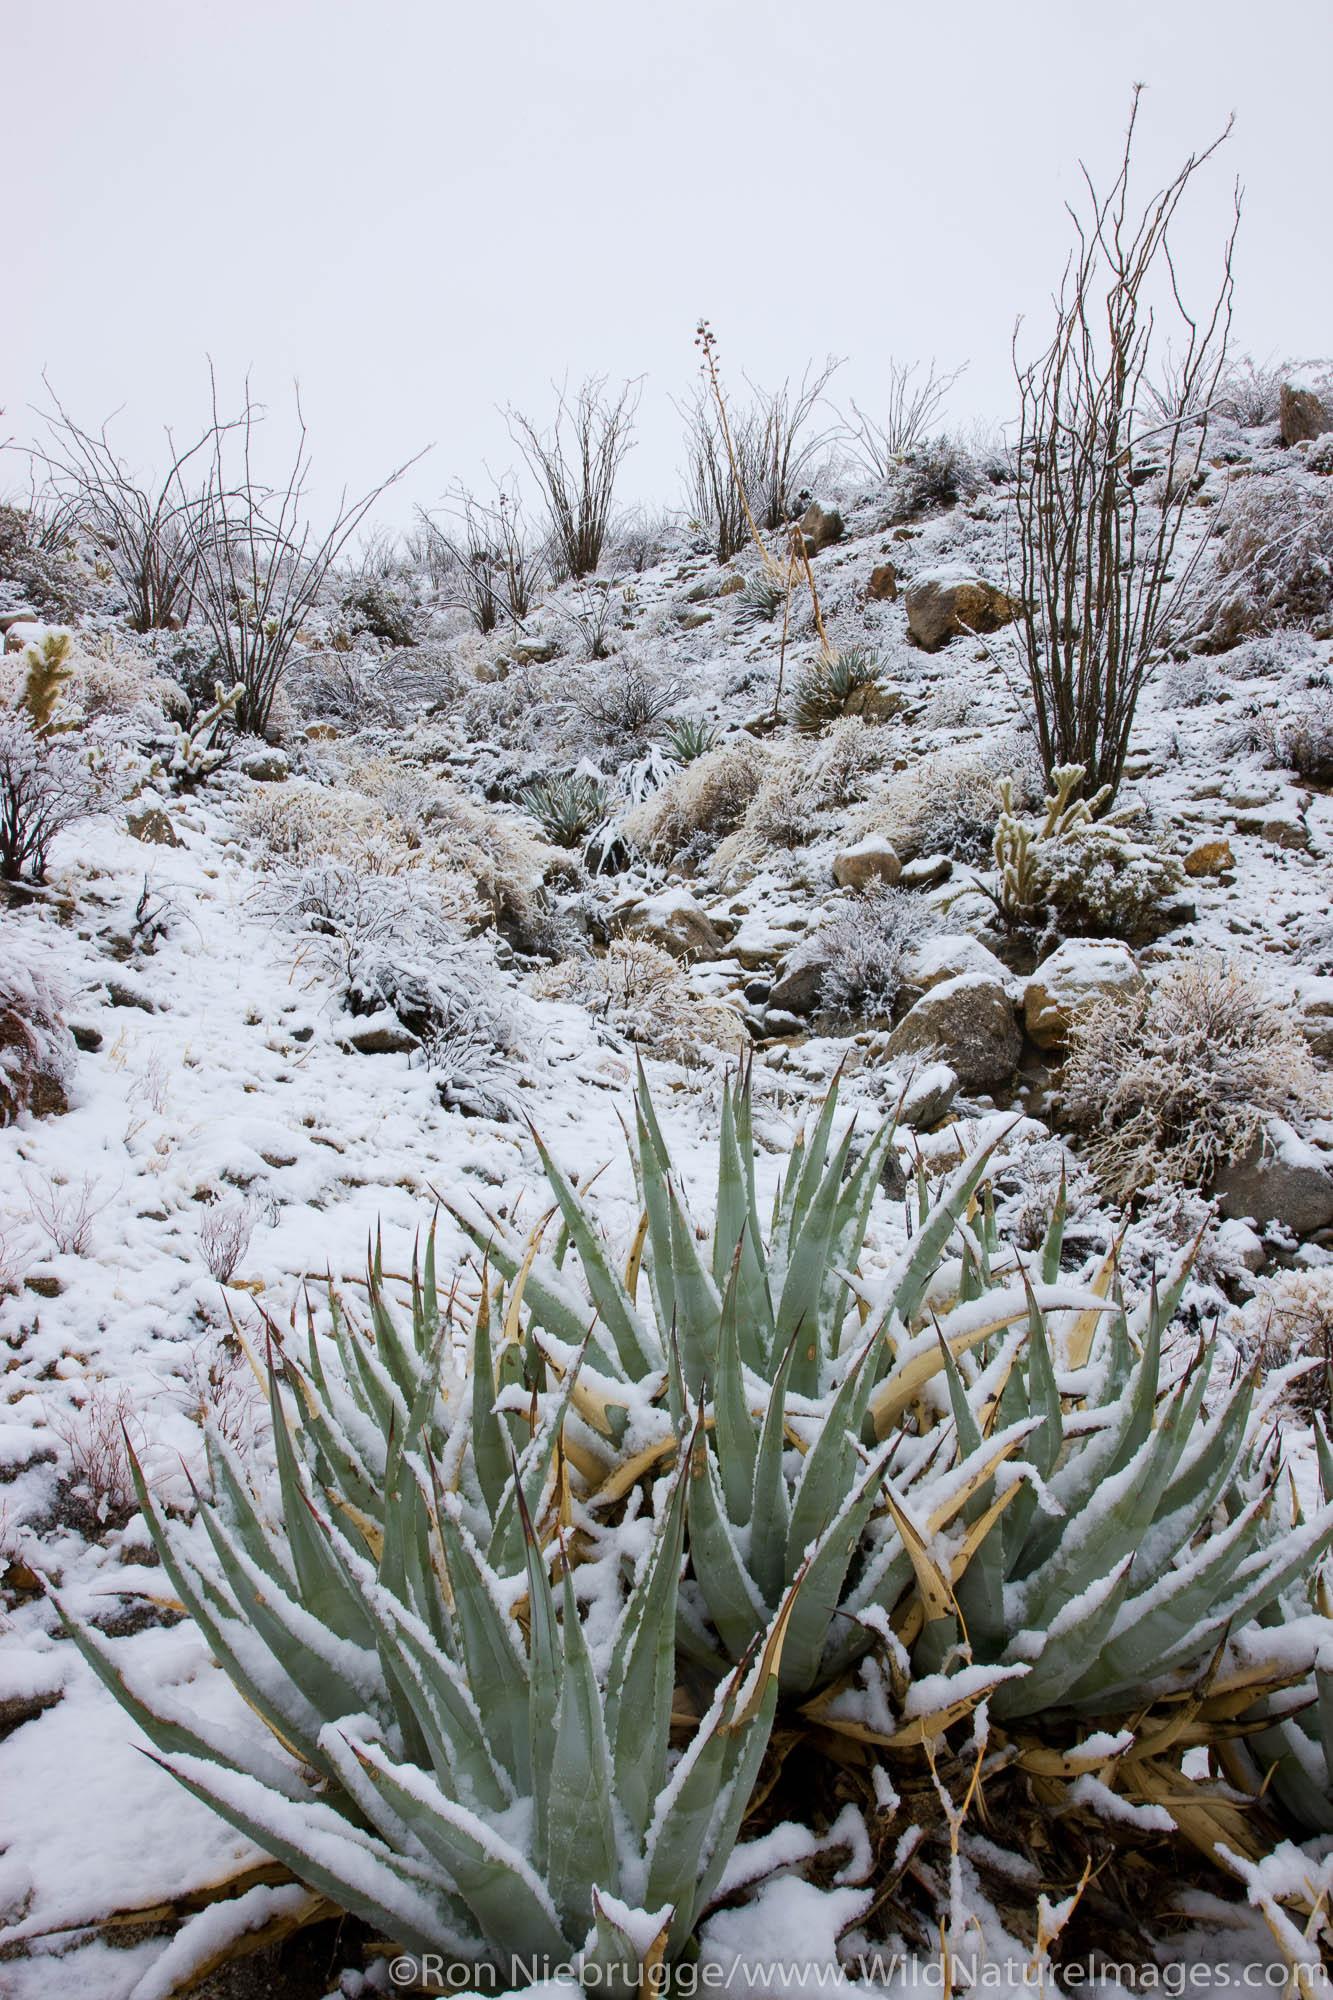 Snow in Anza-Borrego Desert State Park, California.